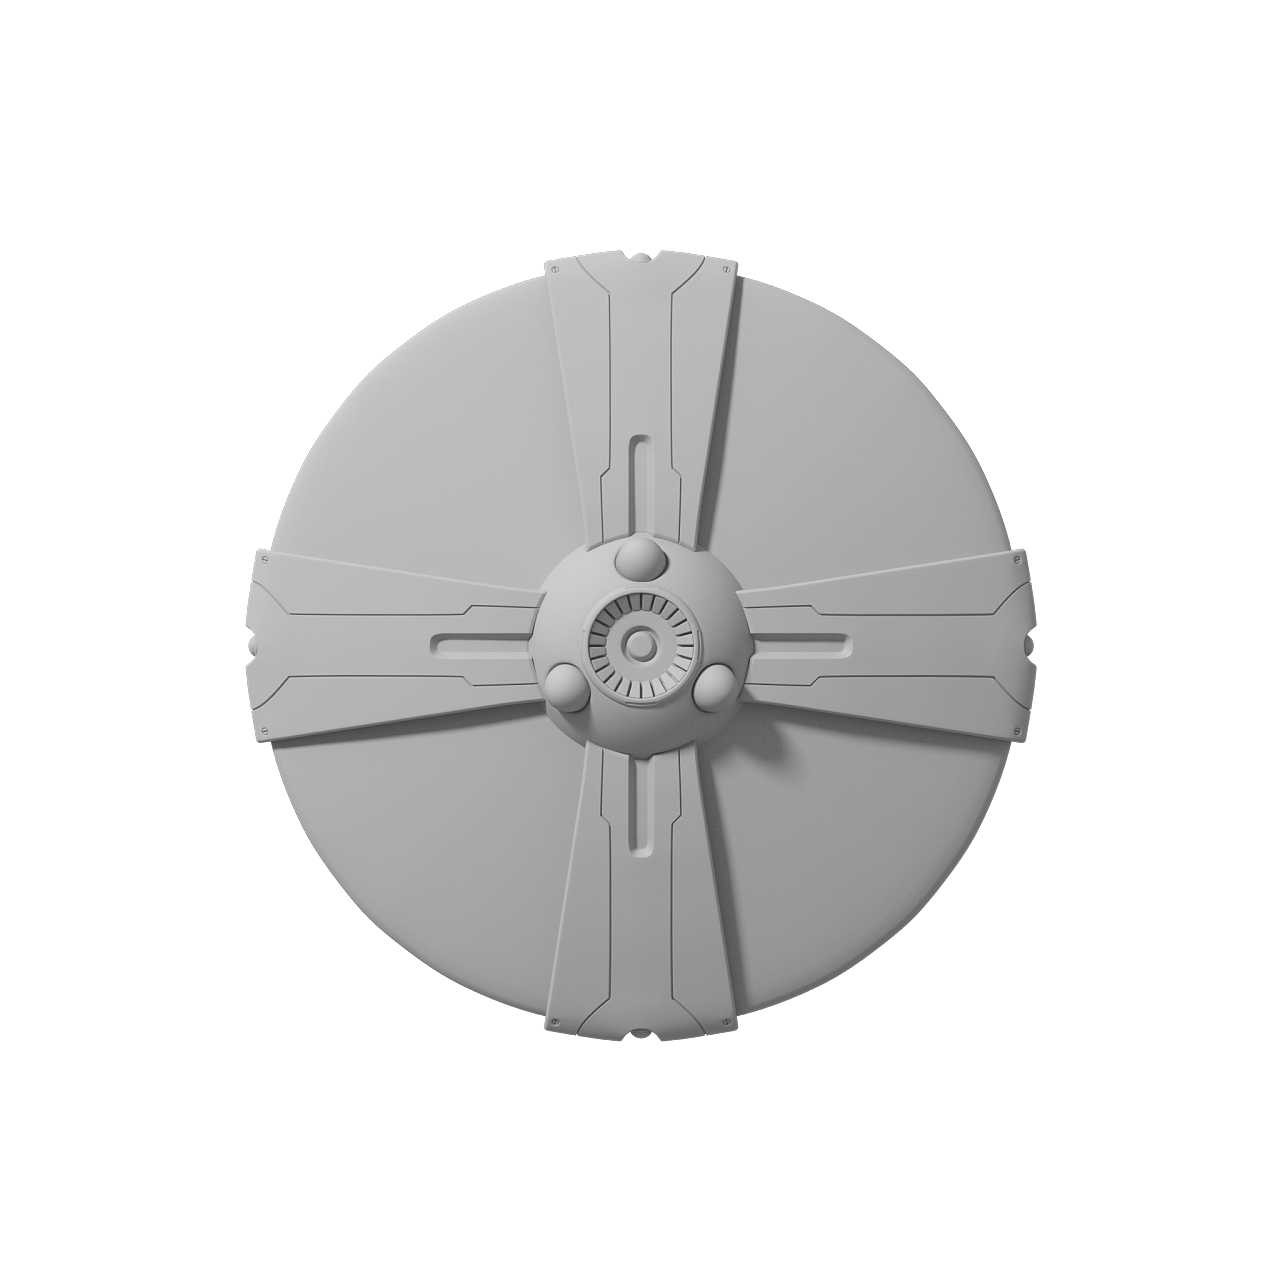 maya建模——飞碟|三维|机械/交通|yhy1956927098